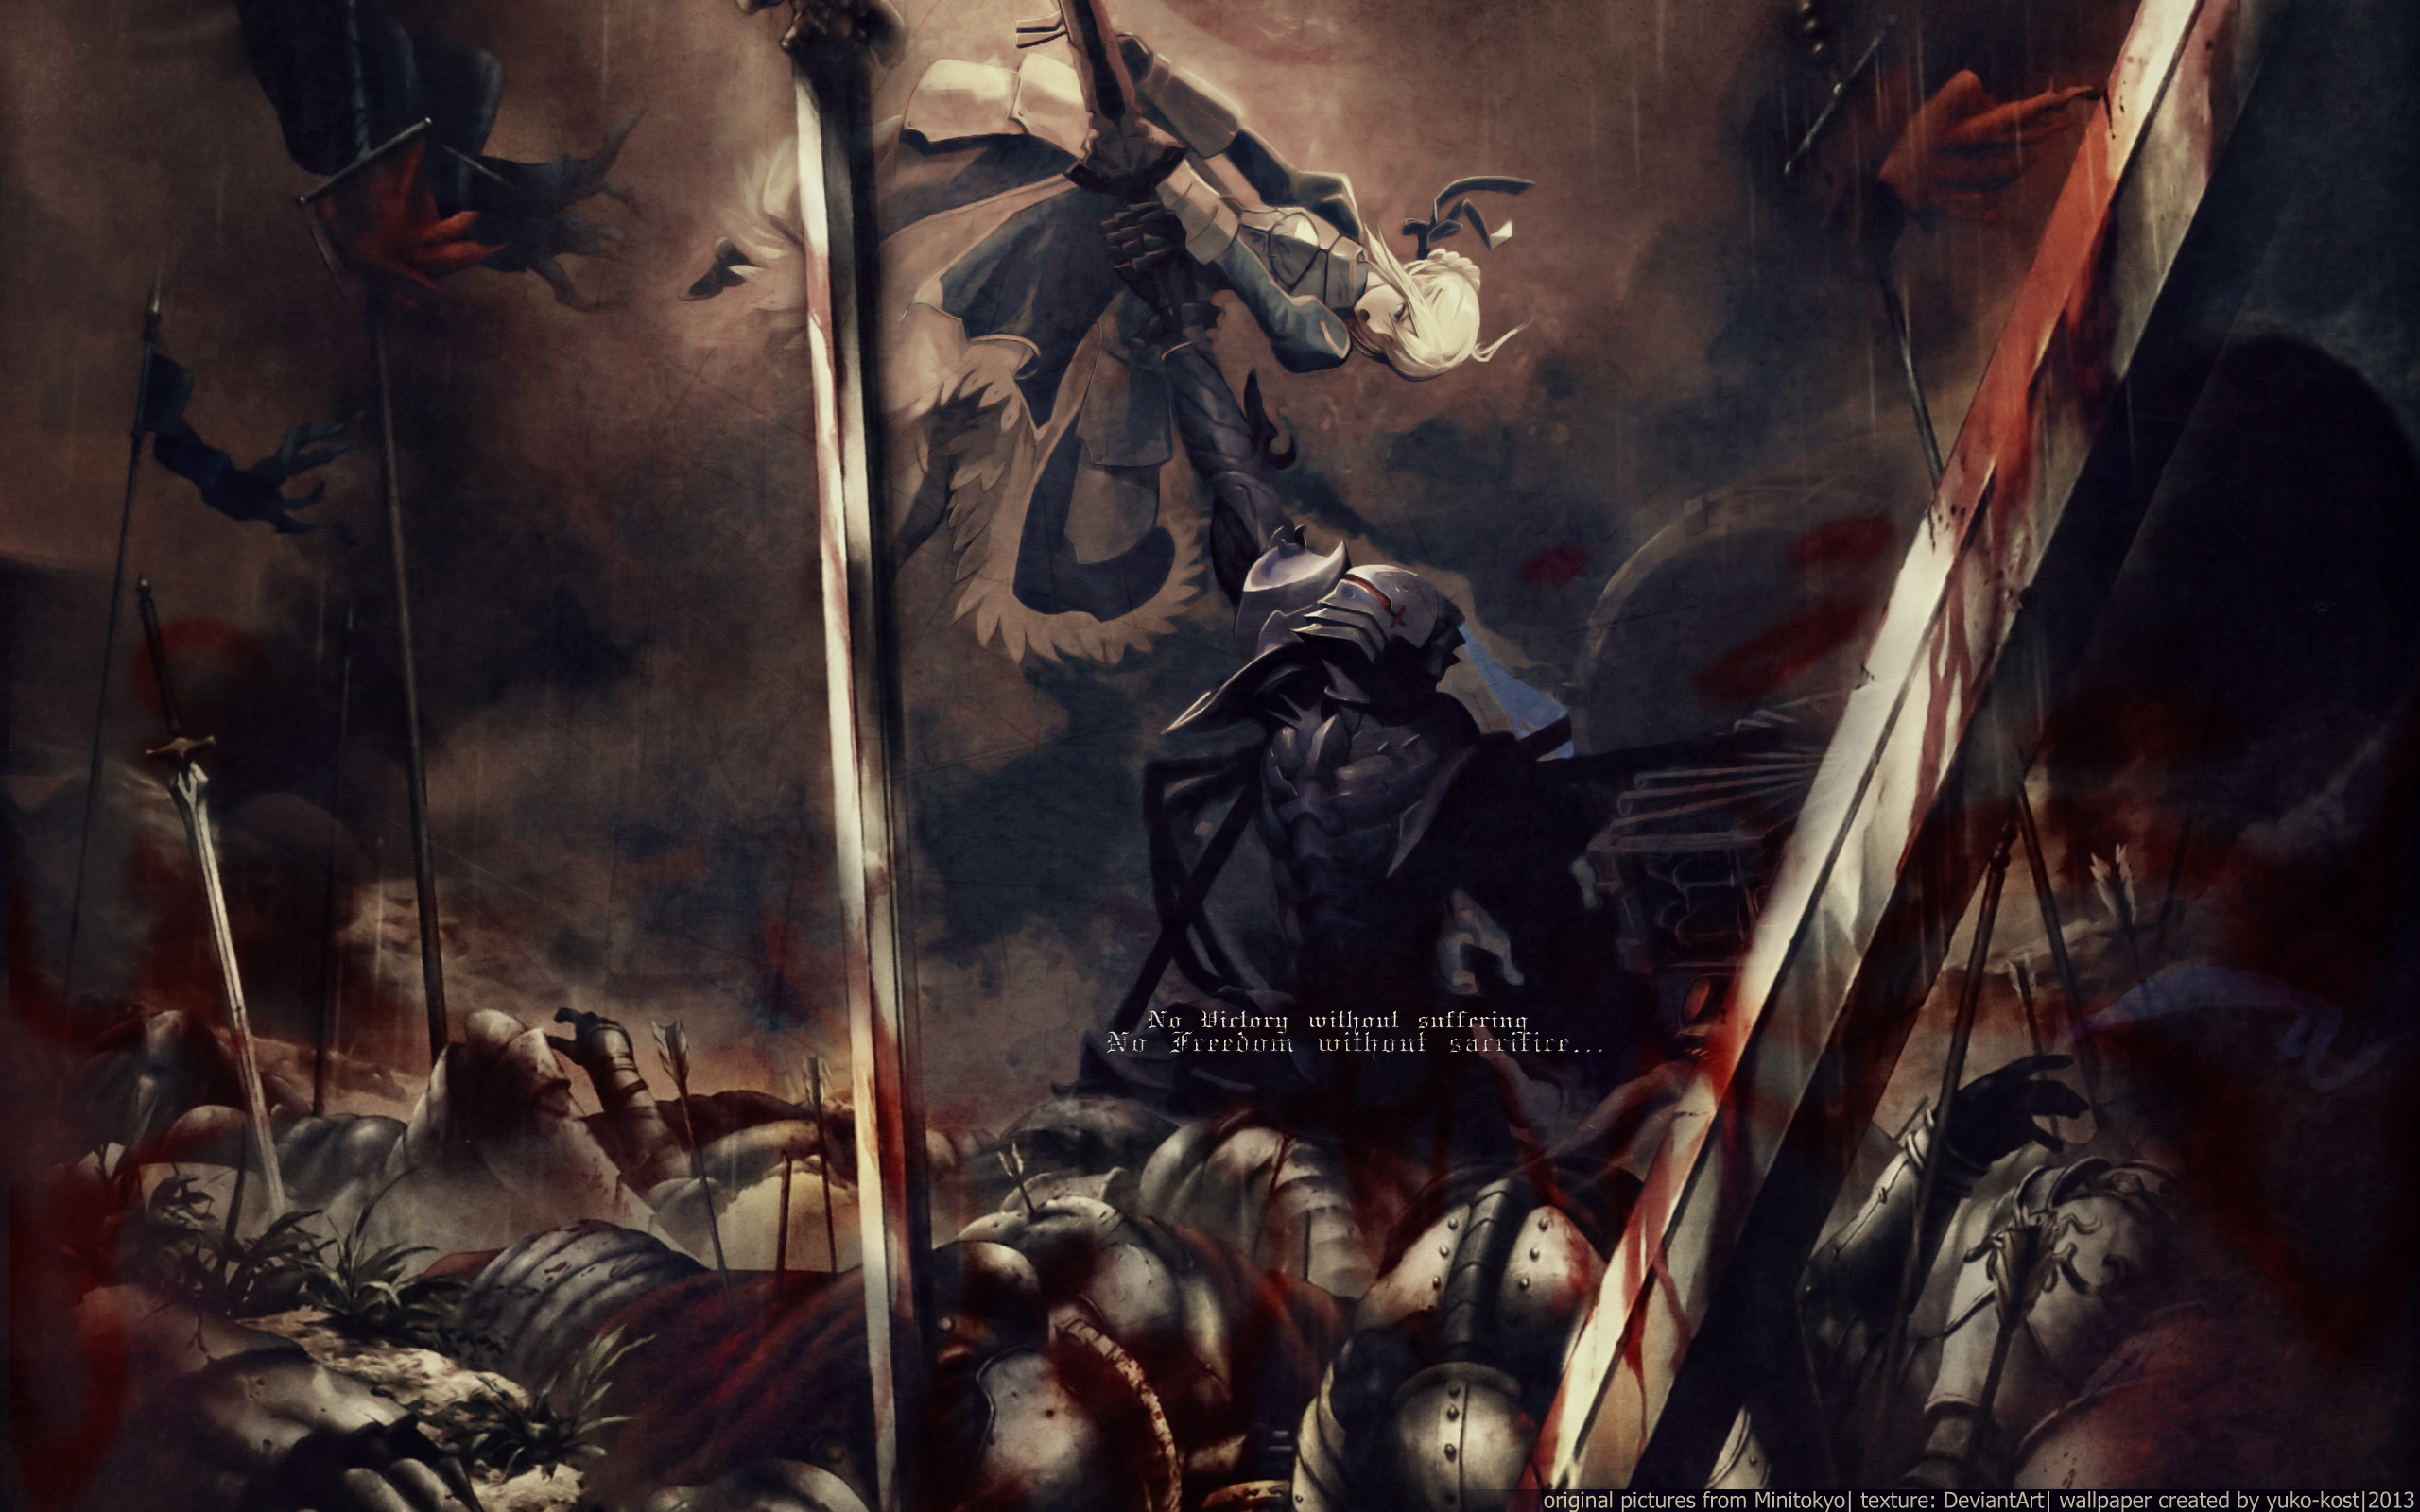 night fate zero saber short hair sword weapon zero berserker wallpaper 2560x1600